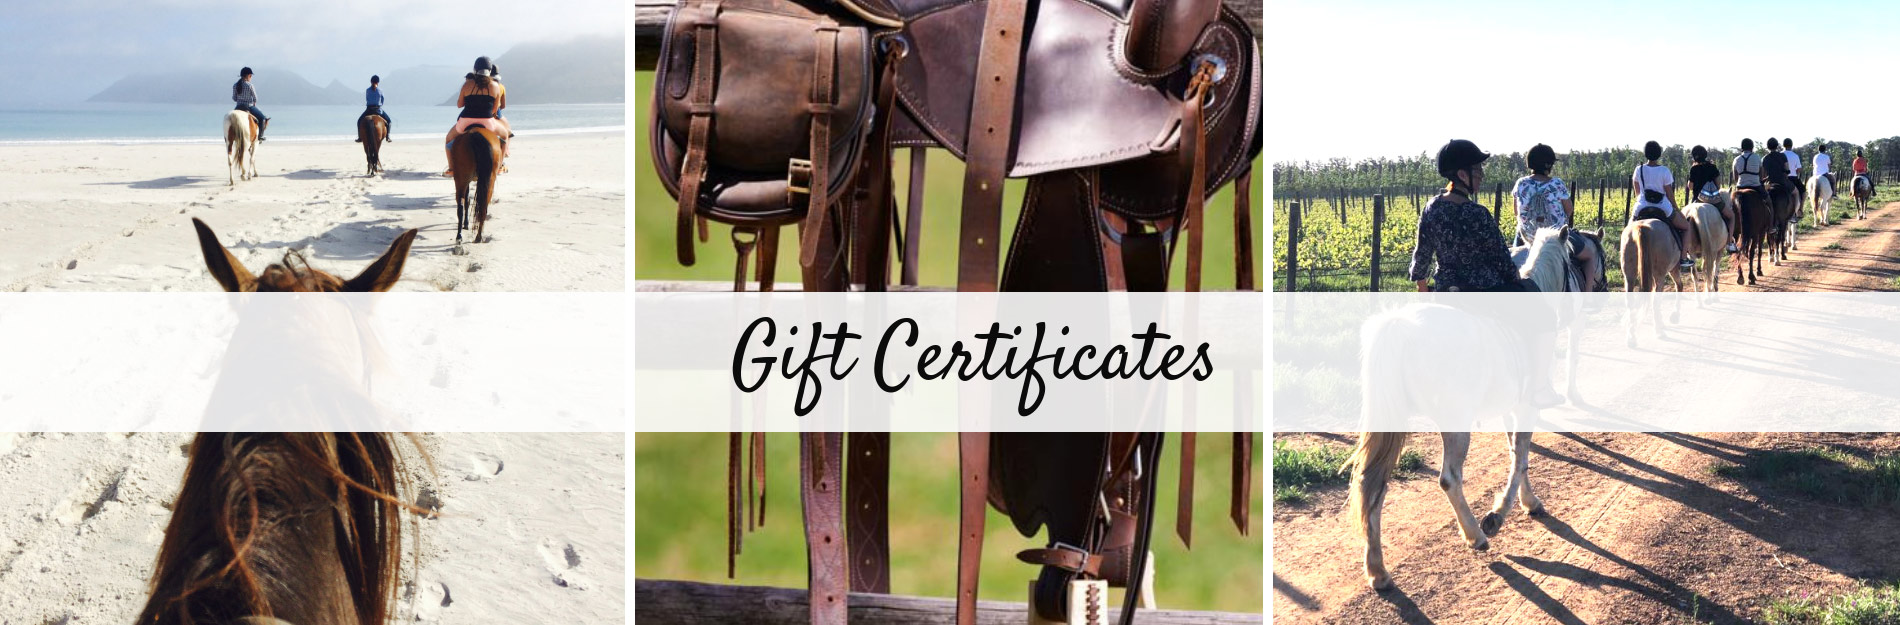 Gift Vouchers - Horse Riding Cape Town